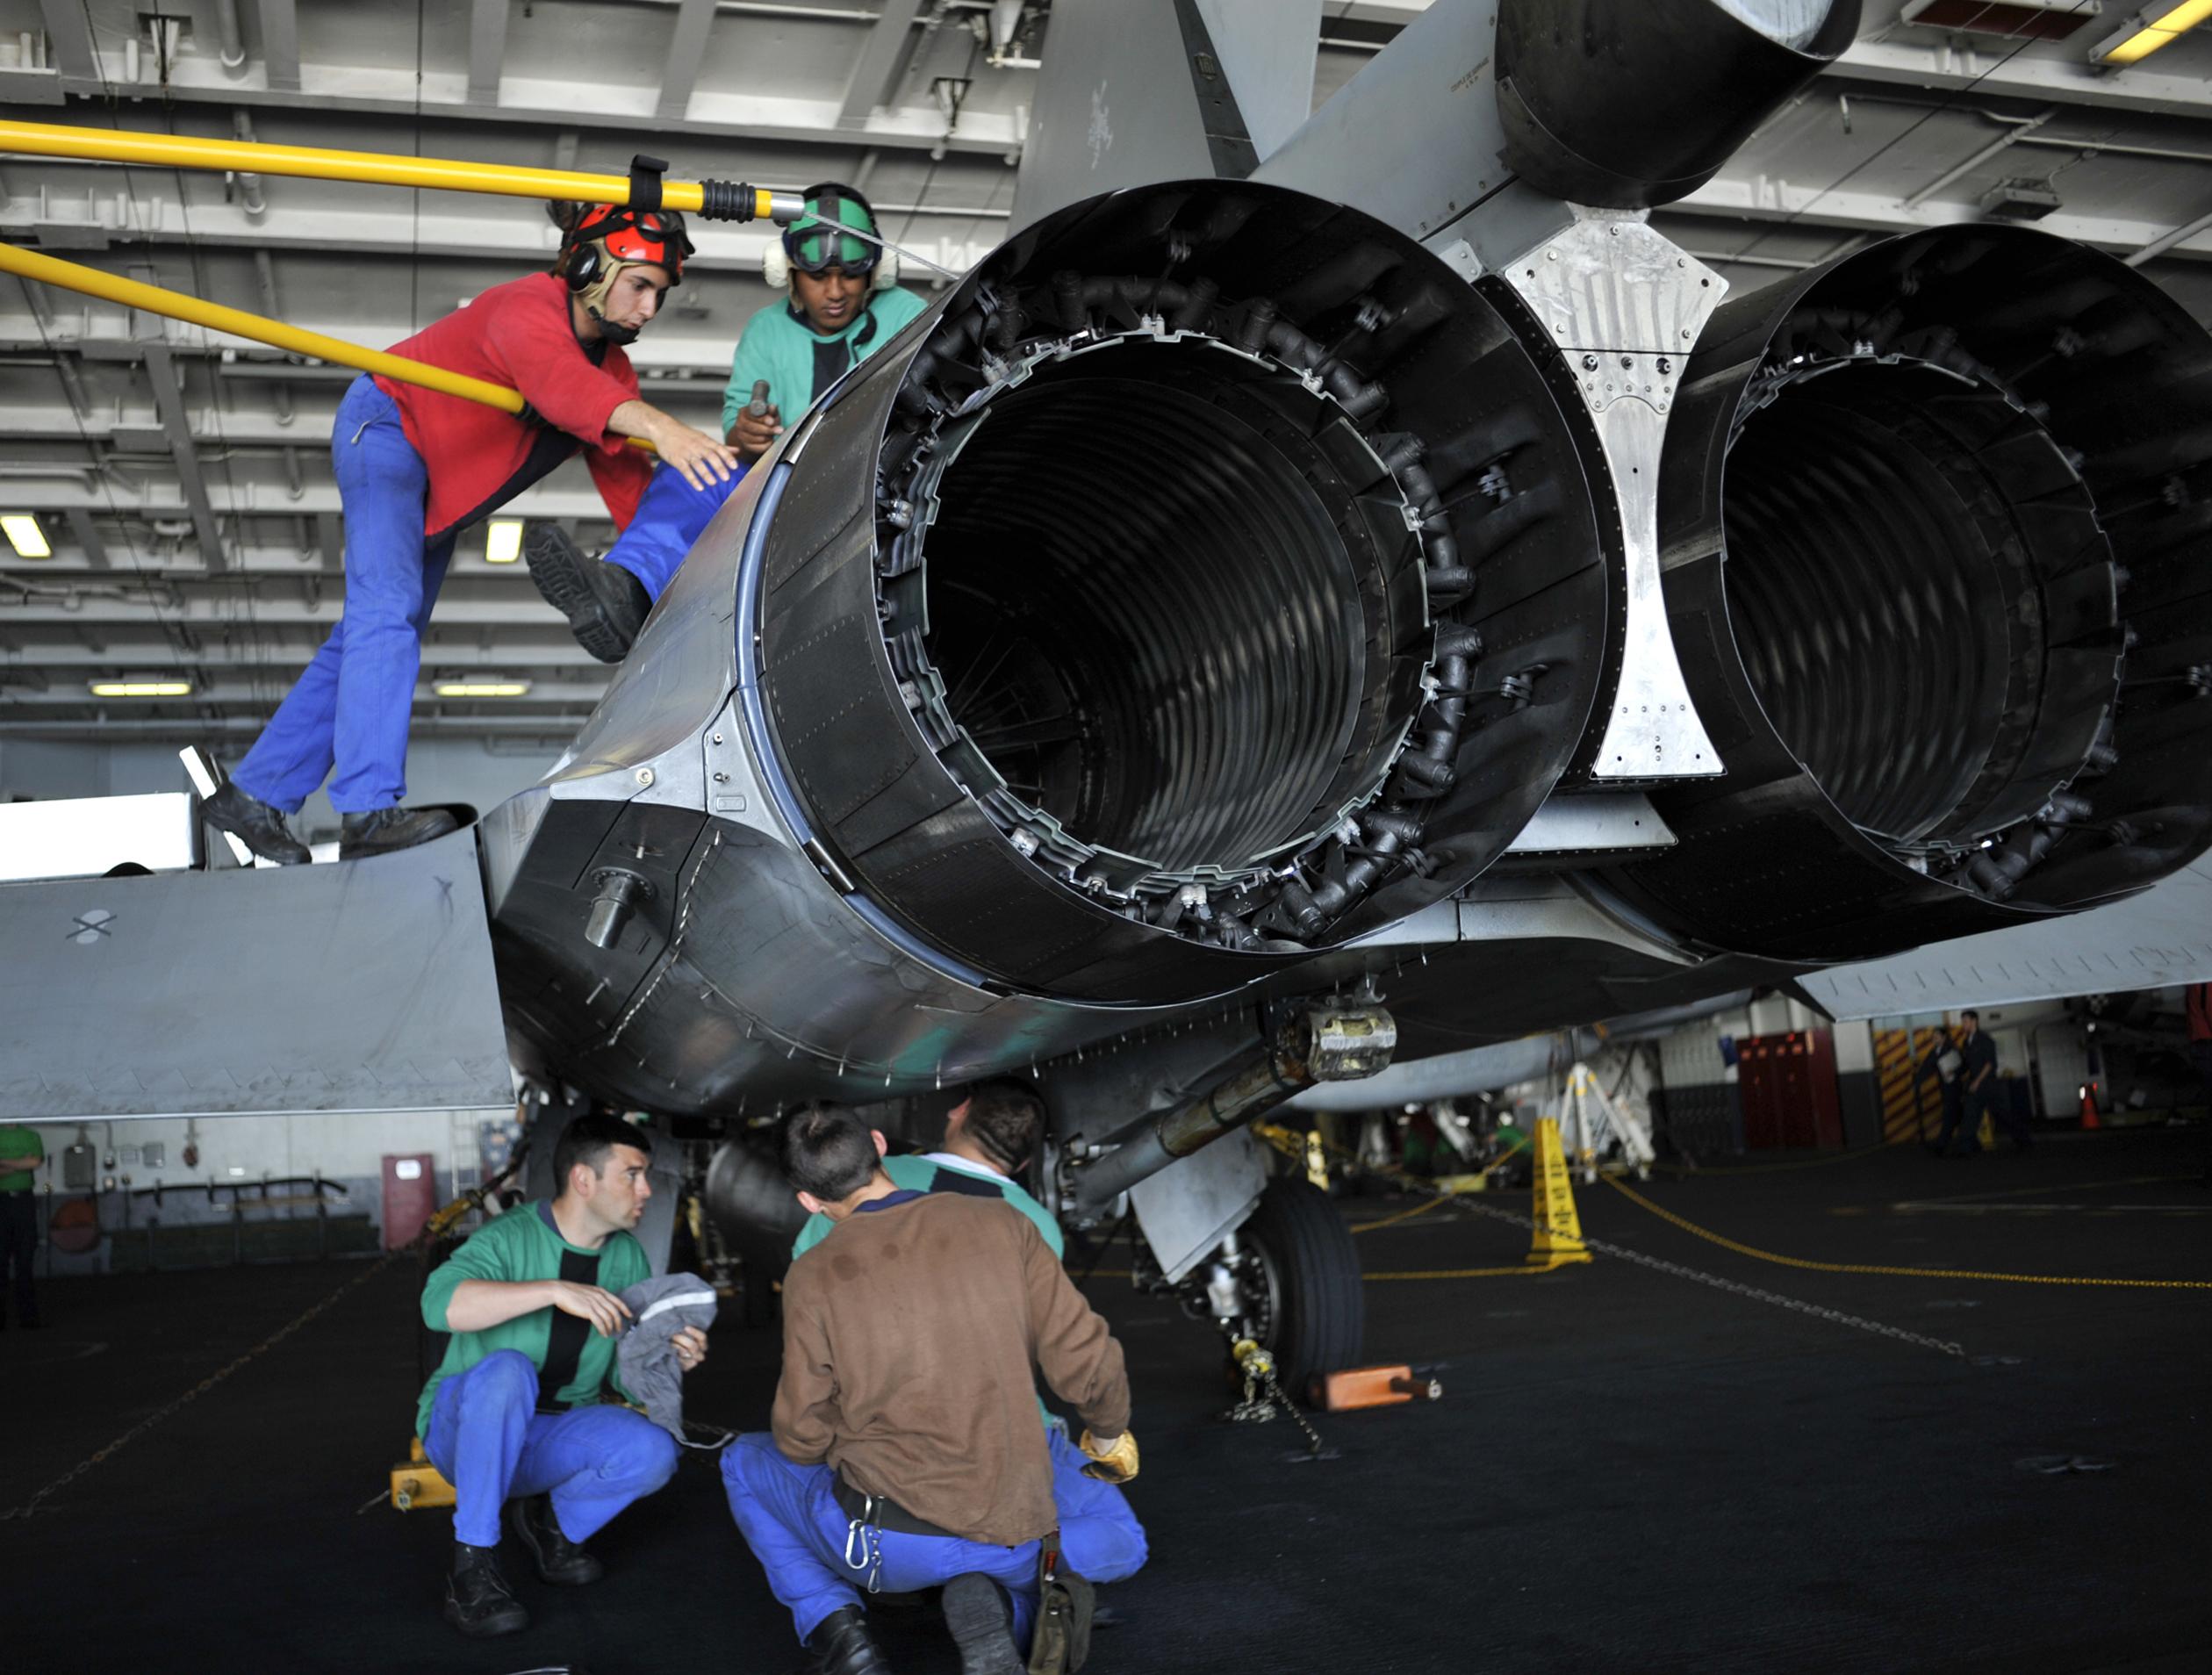 Air Craft Mechanic School Van Nuys